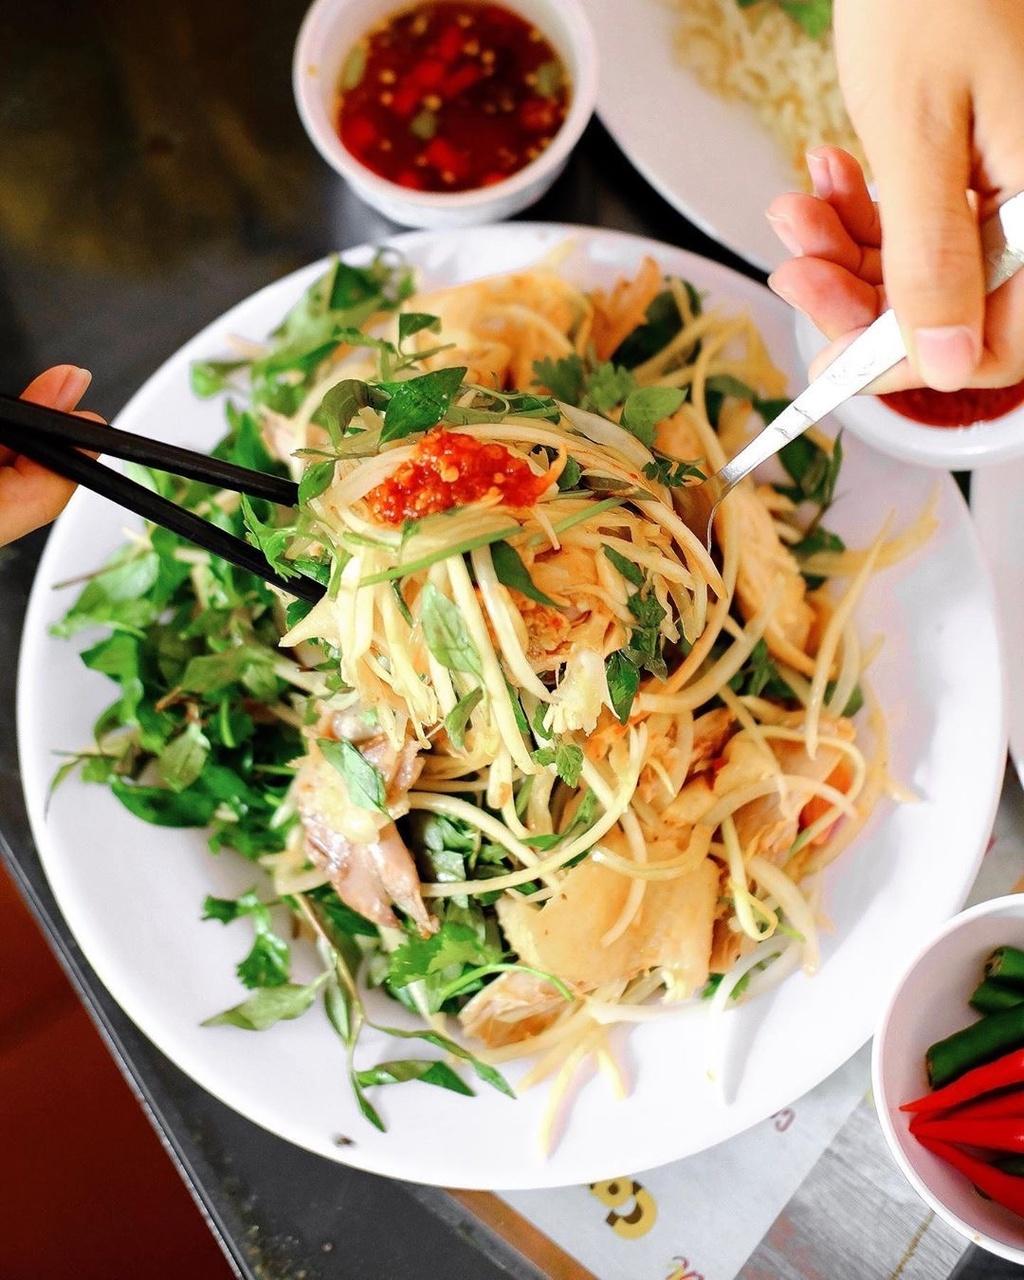 4 mon com chinh phuc du khach tai Viet Nam hinh anh 4 IMG_3404.JPG